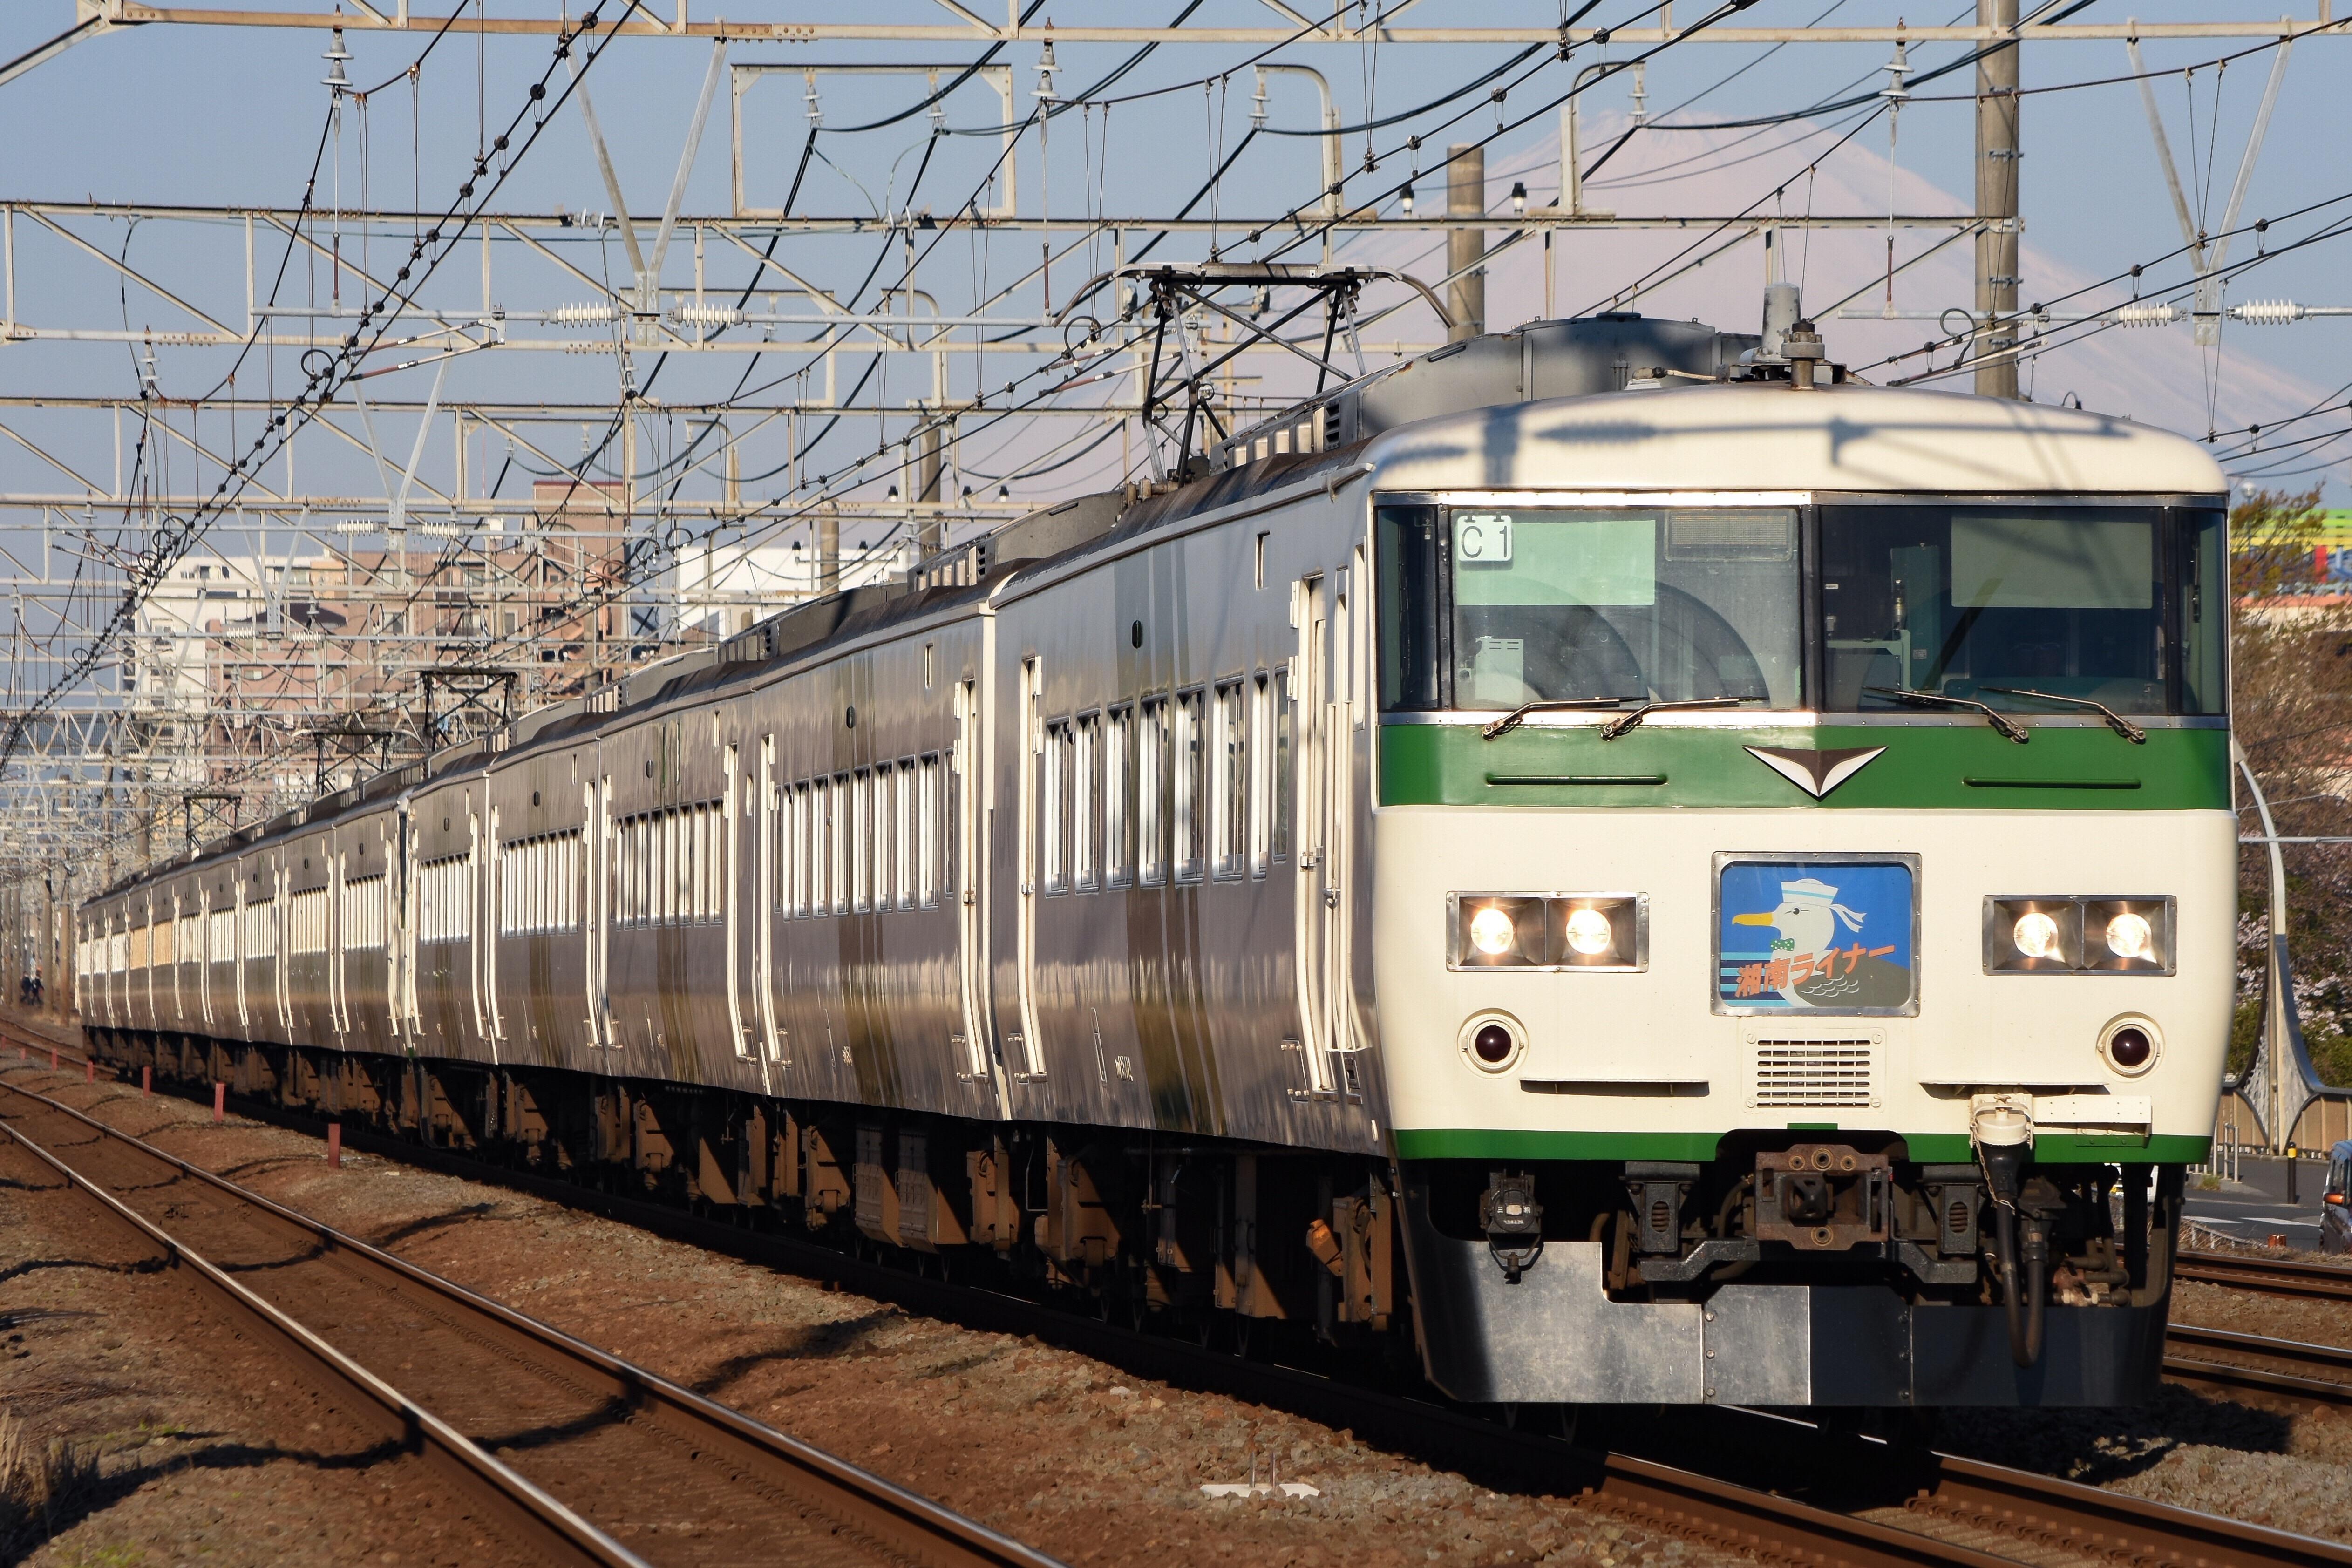 f:id:Nagaoka103:20190407161449j:image